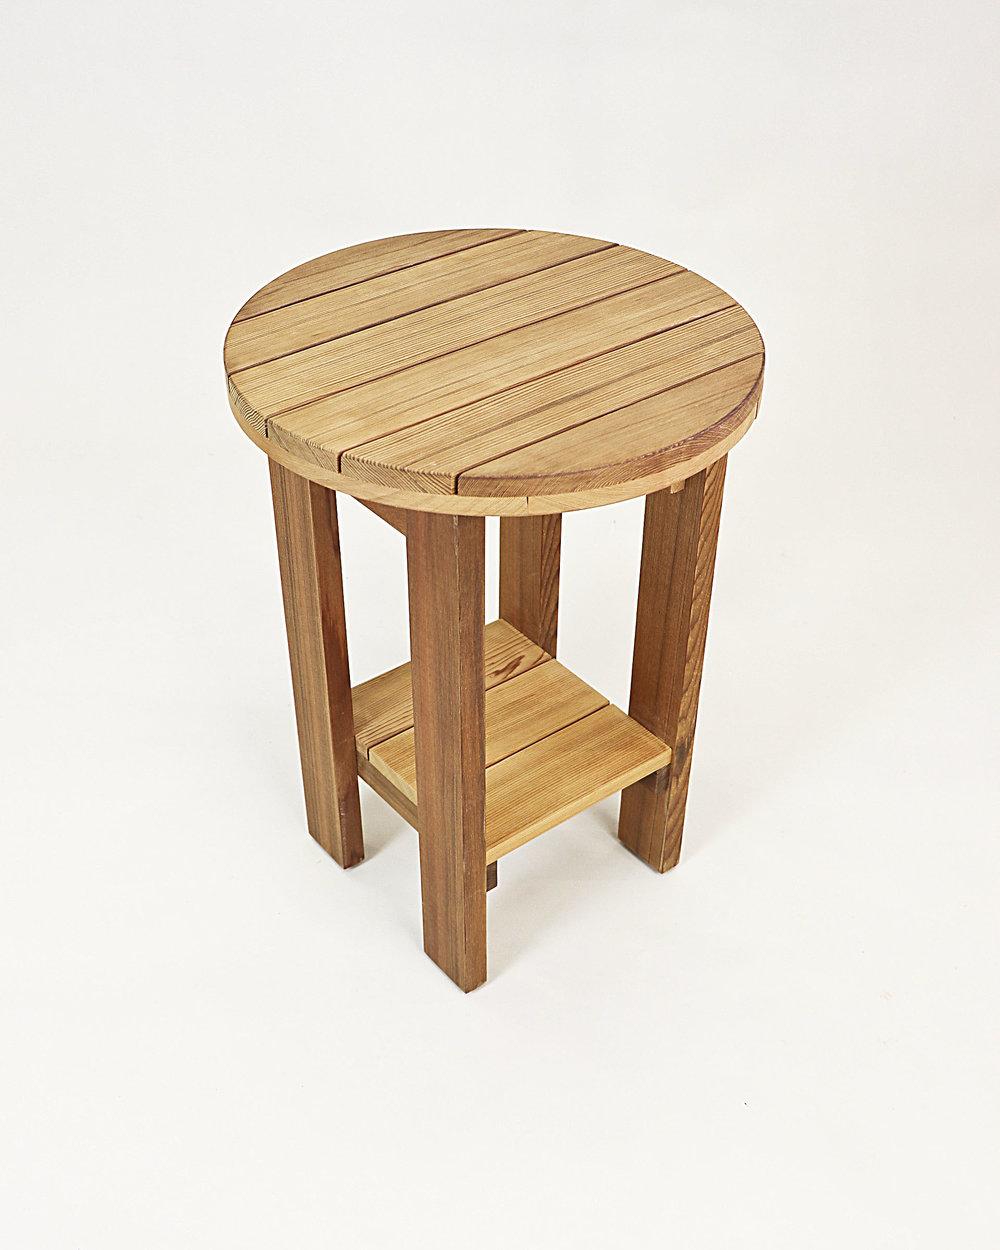 Adirondack table 1.jpg